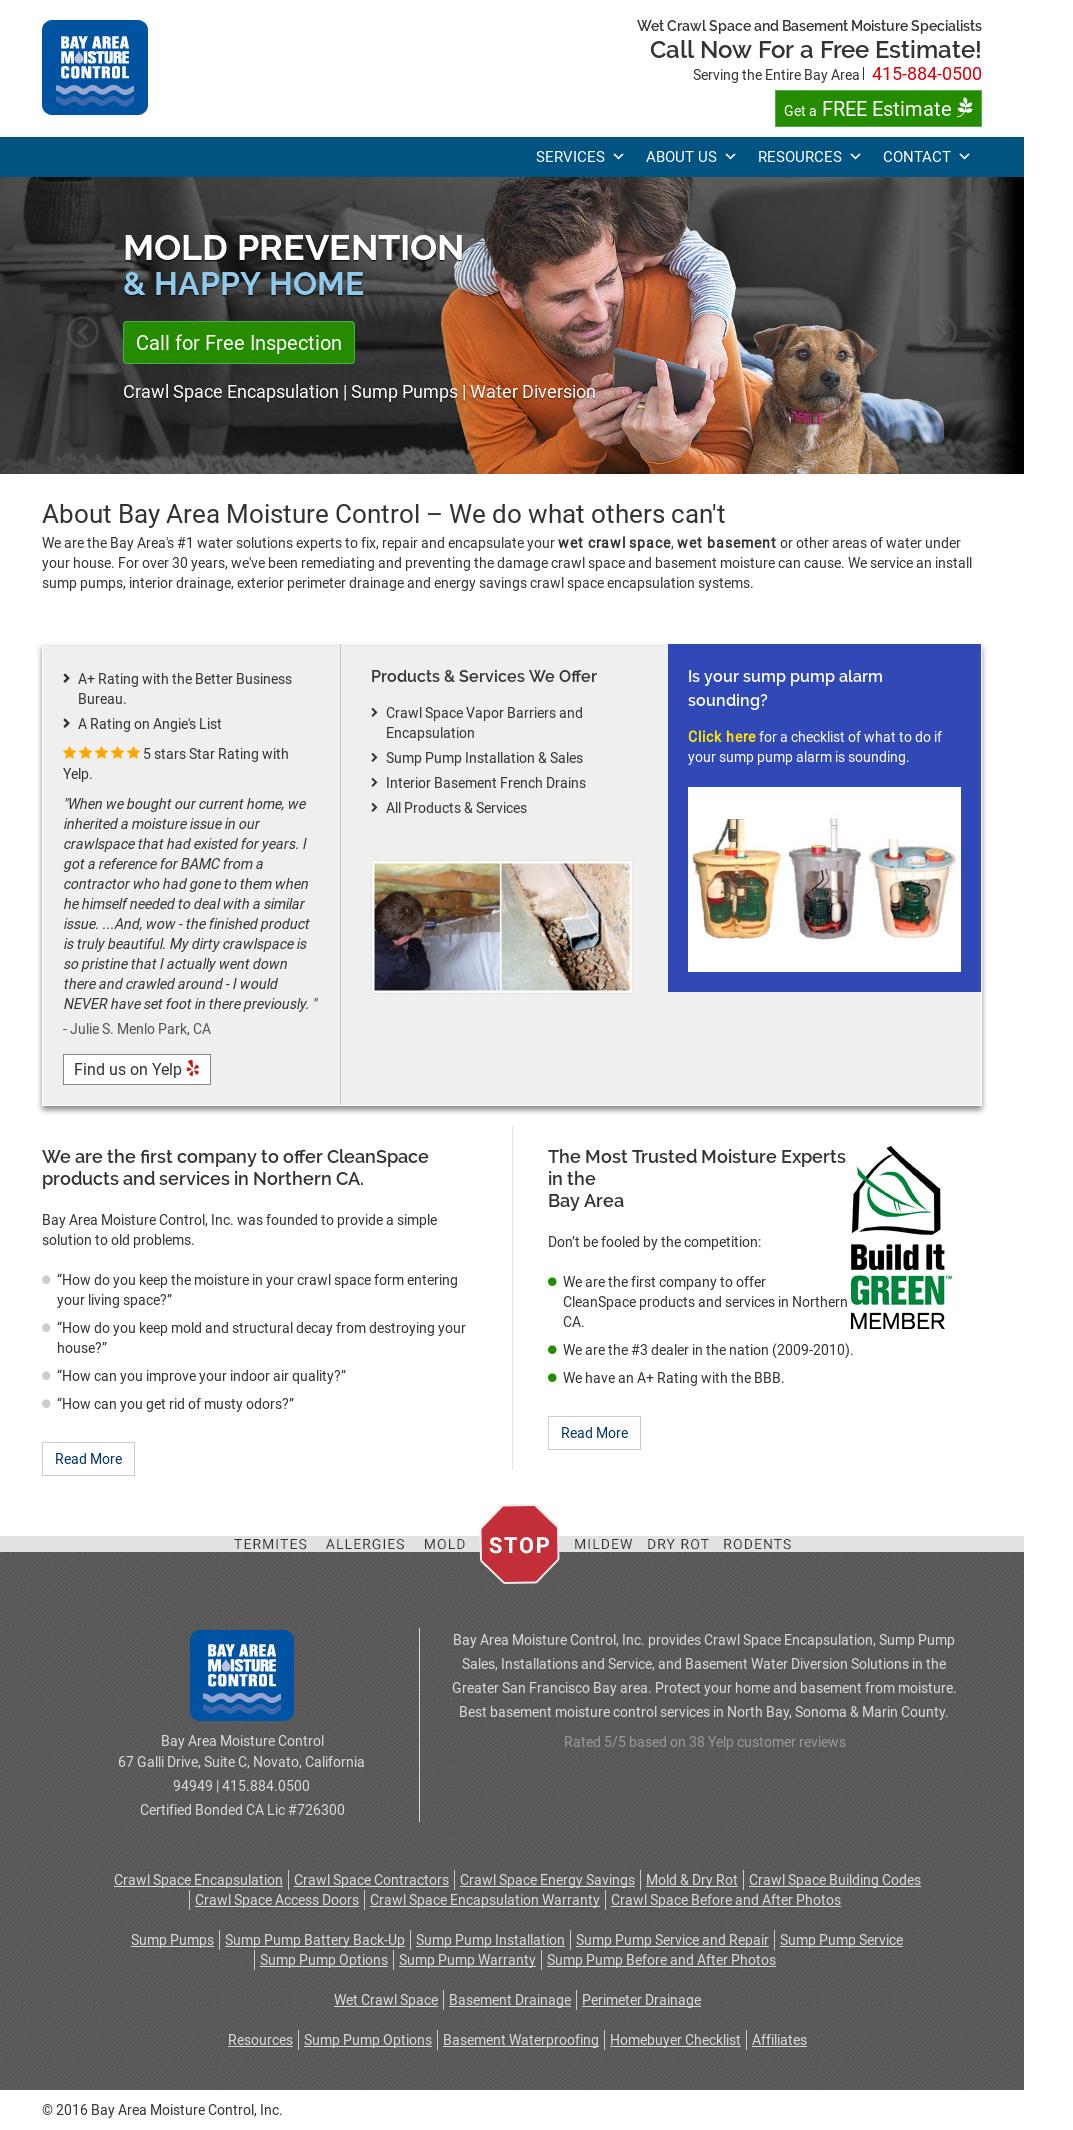 Bay Area Moisture Control Website History